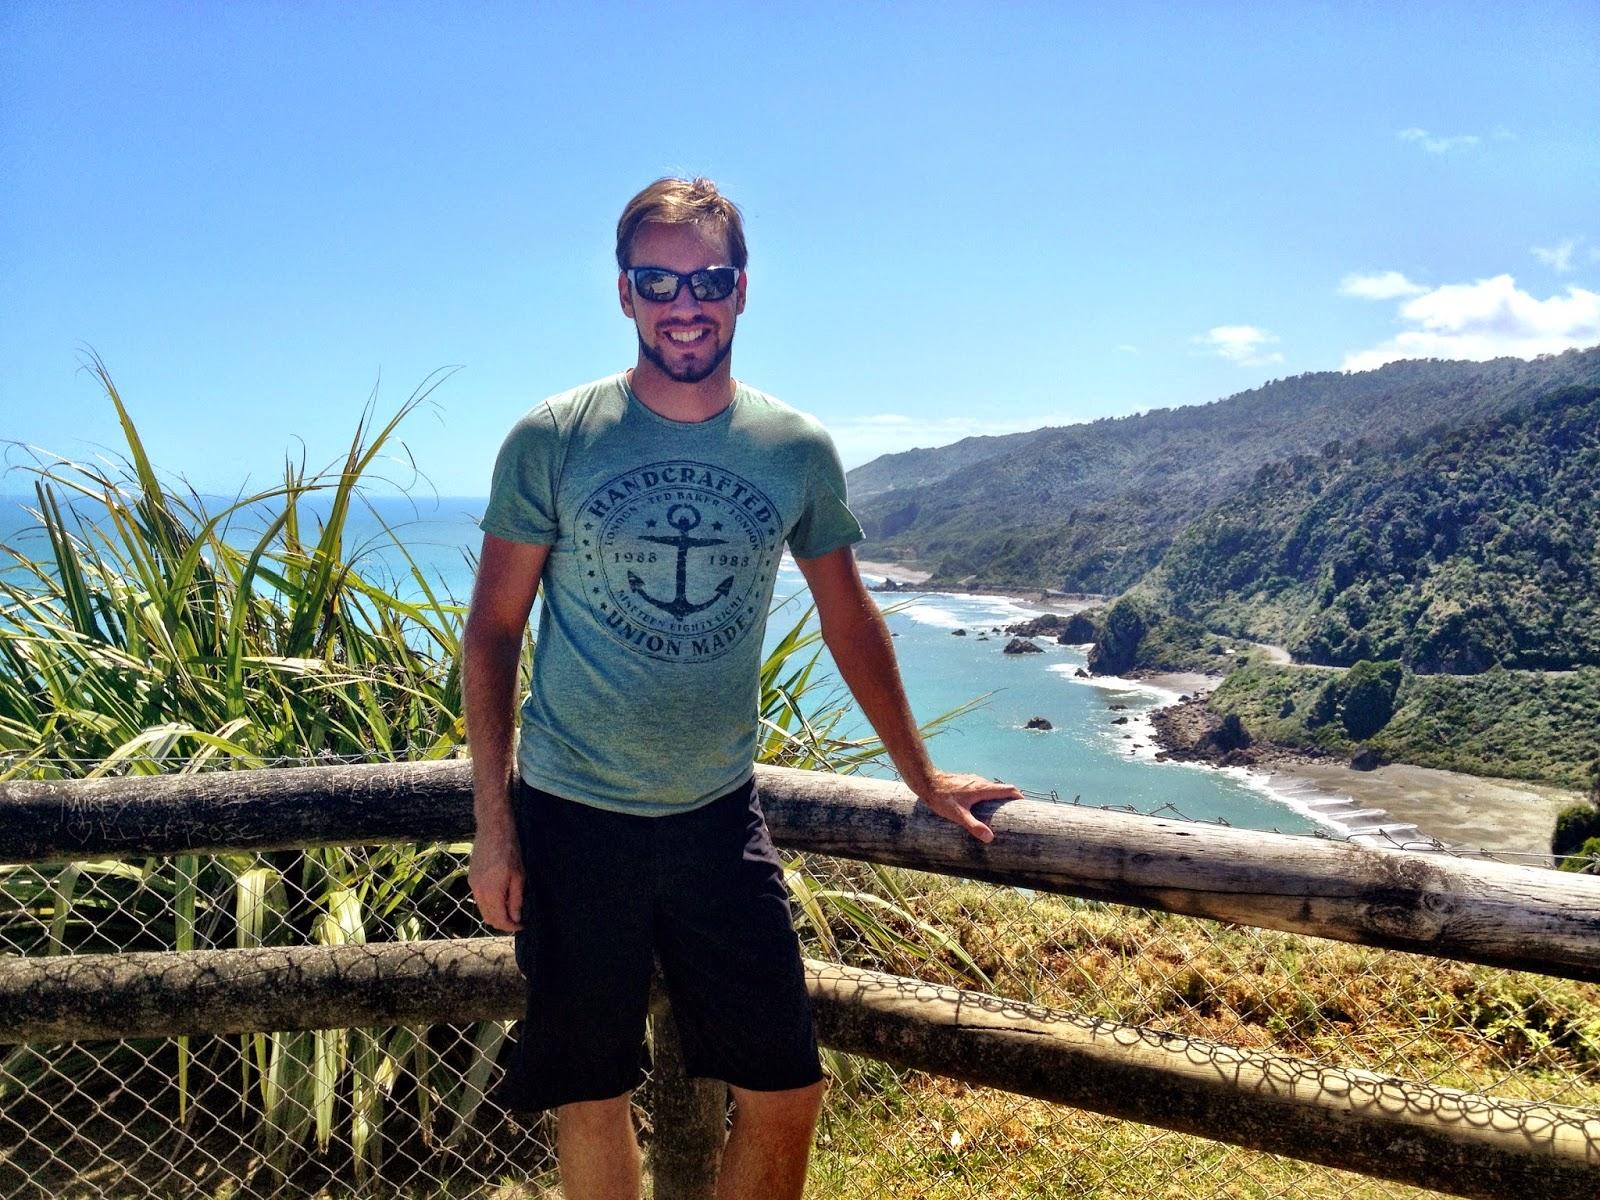 Simon overlooking New Zealand's South Island coastline (West)